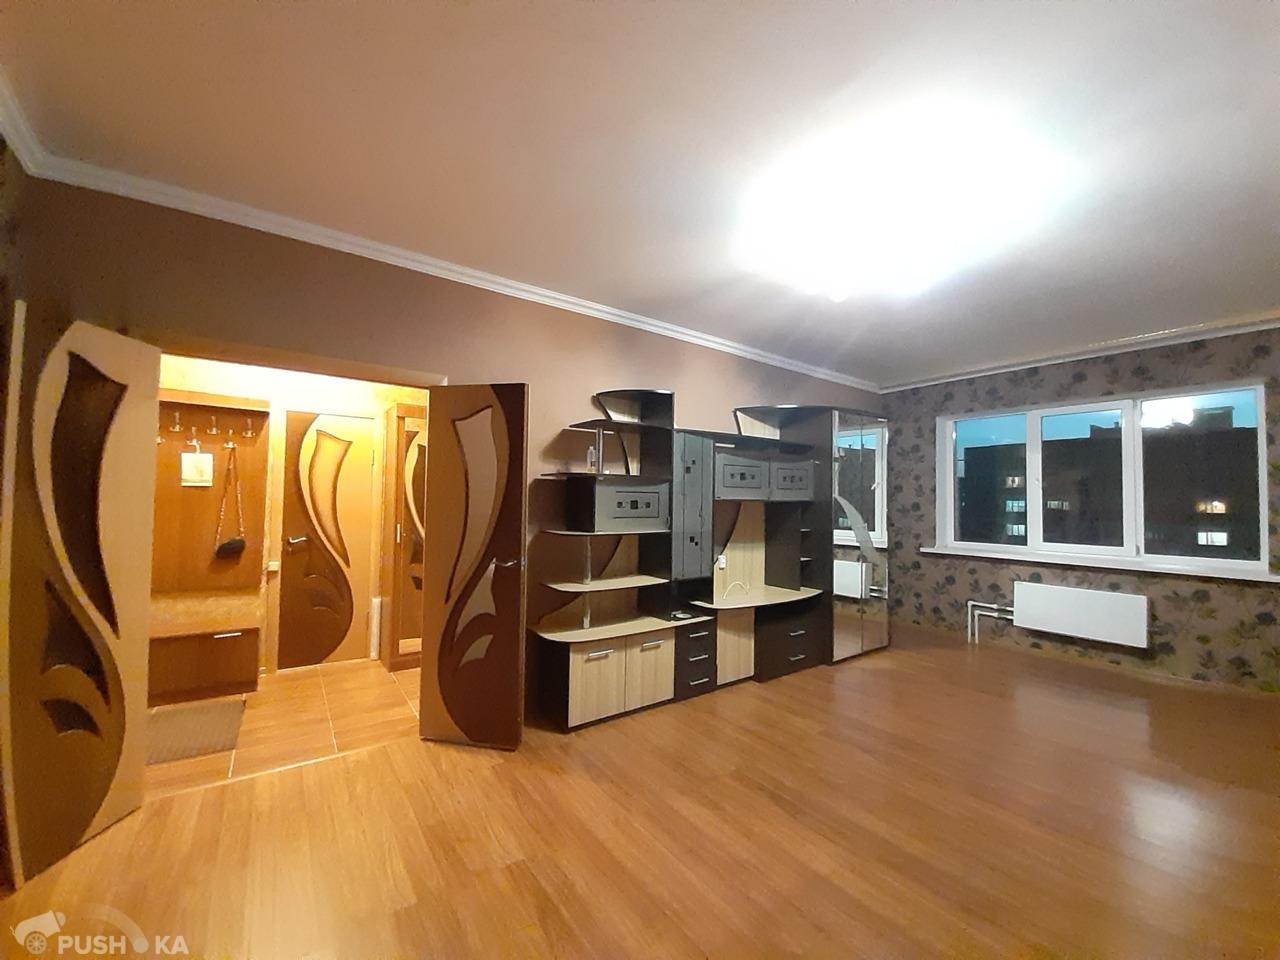 Продаётся 1-комнатная квартира 45.0 кв.м. этаж 10/16 за 2 050 000 руб